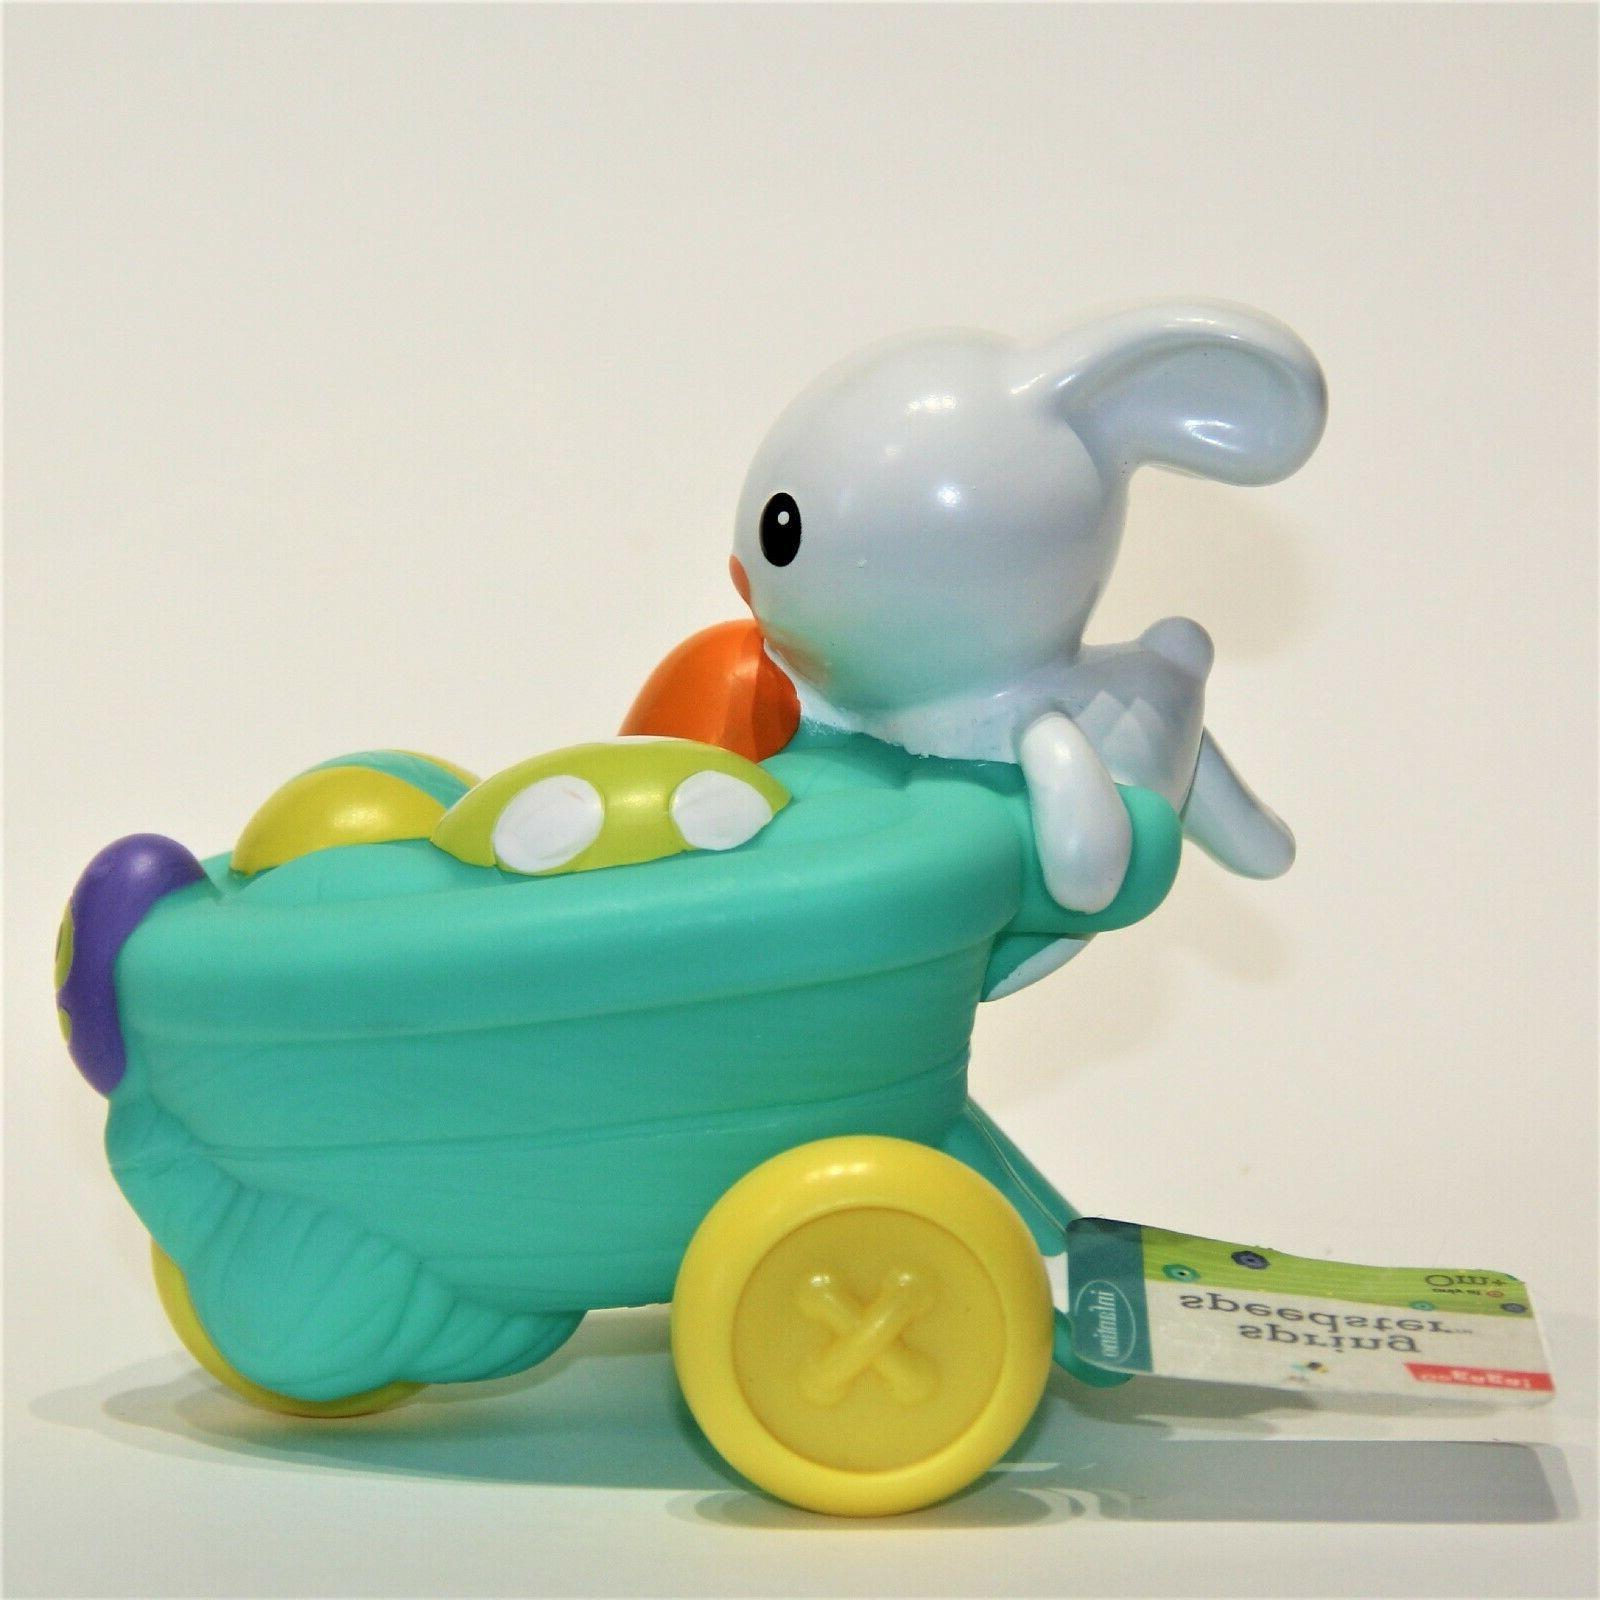 Infantino Go Gaga Toy Activity Cart Flower Orange